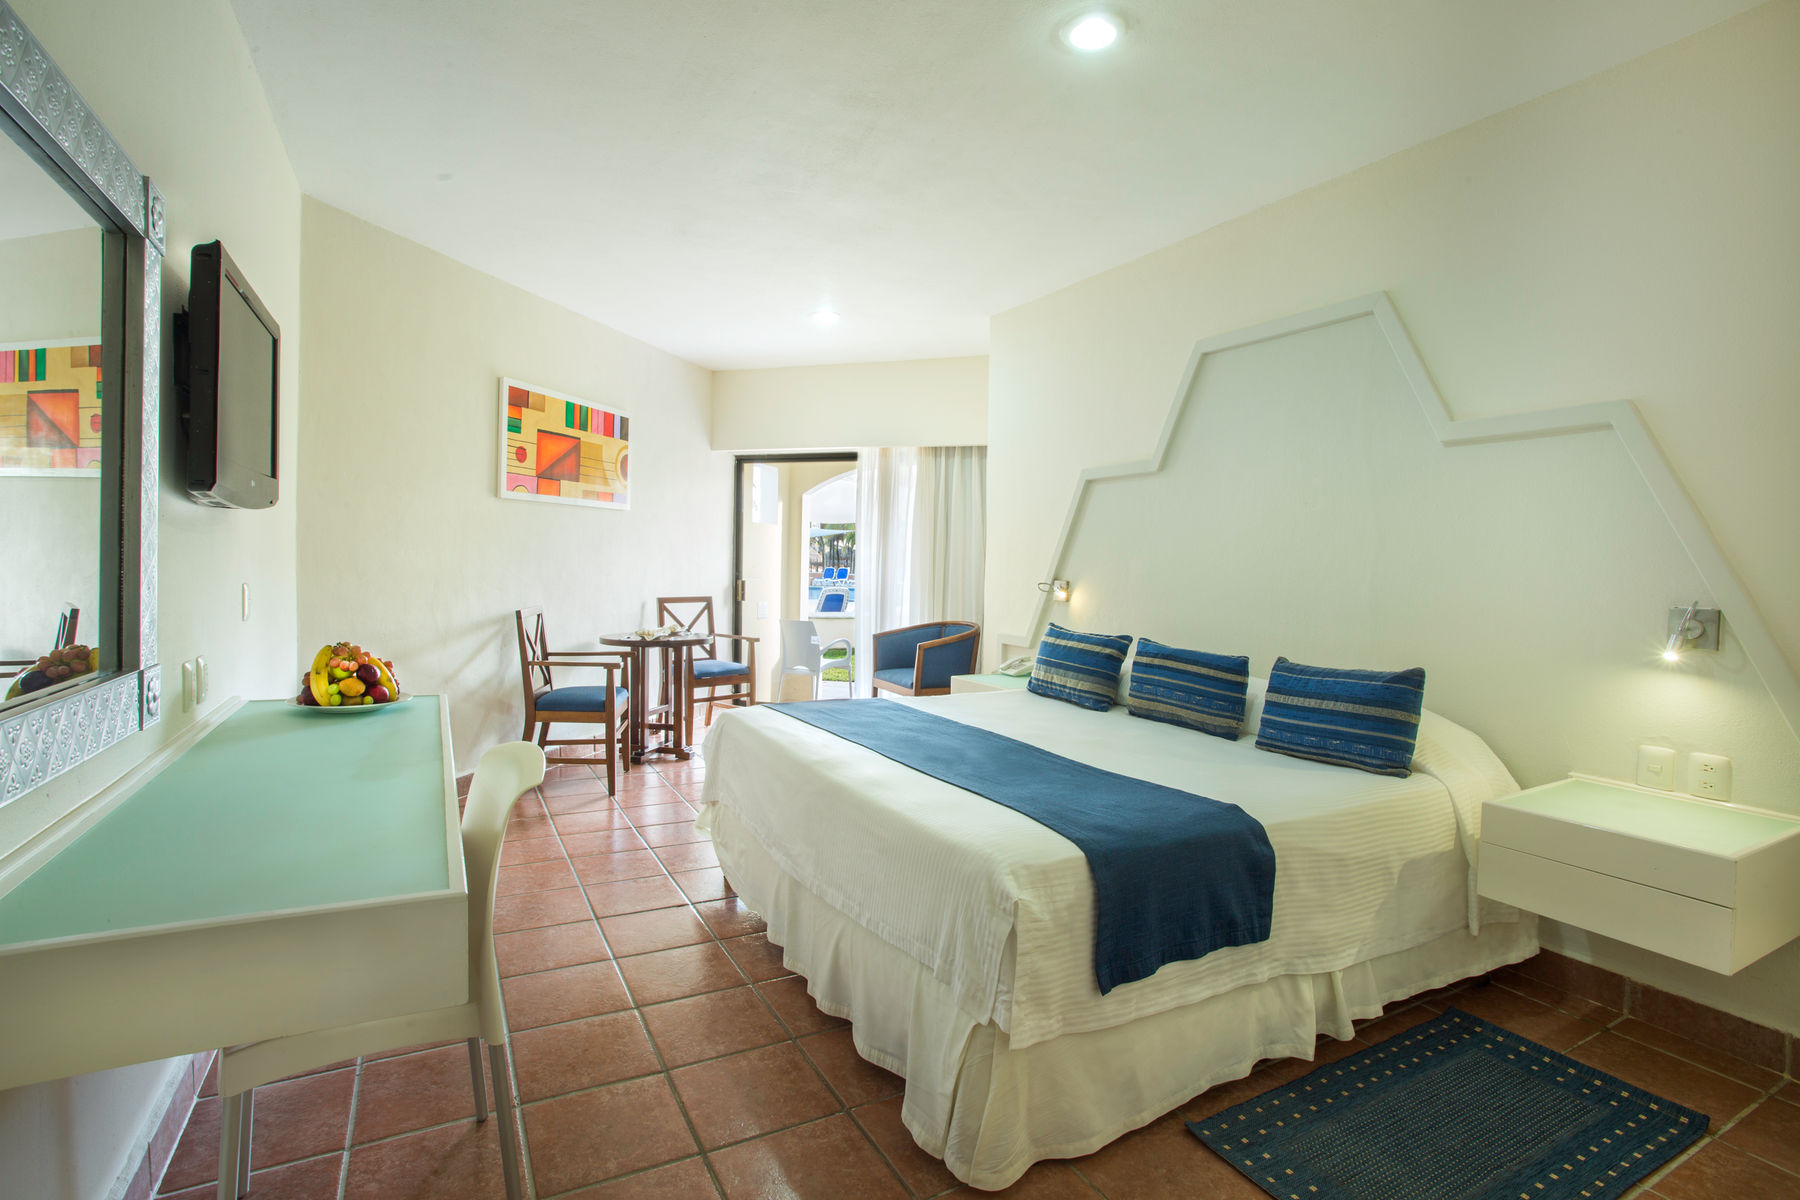 Hotel Club Viva 4 (TurkeyMarmarisArmutalan): photos, room description, service, tips and tourist reviews 34